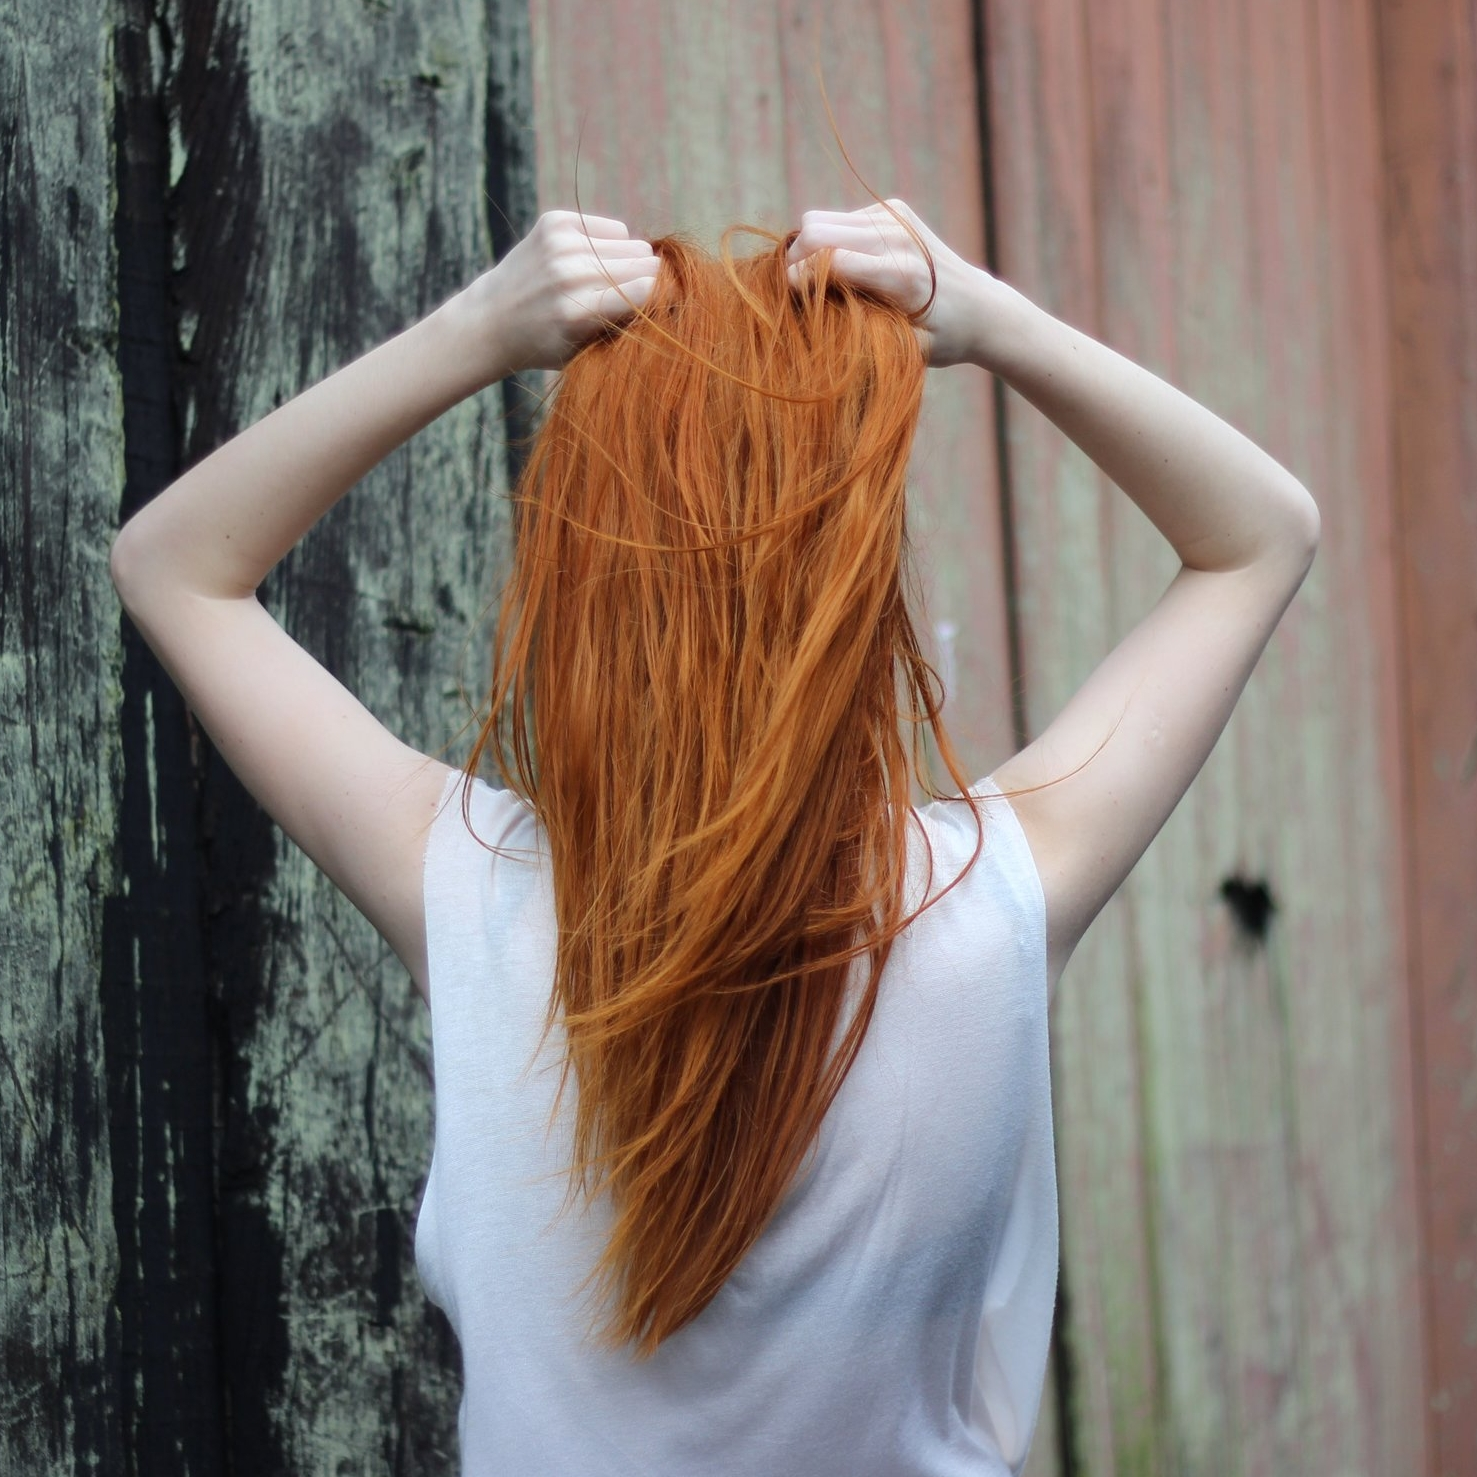 adolescent-back-view-blonde-332984.jpg